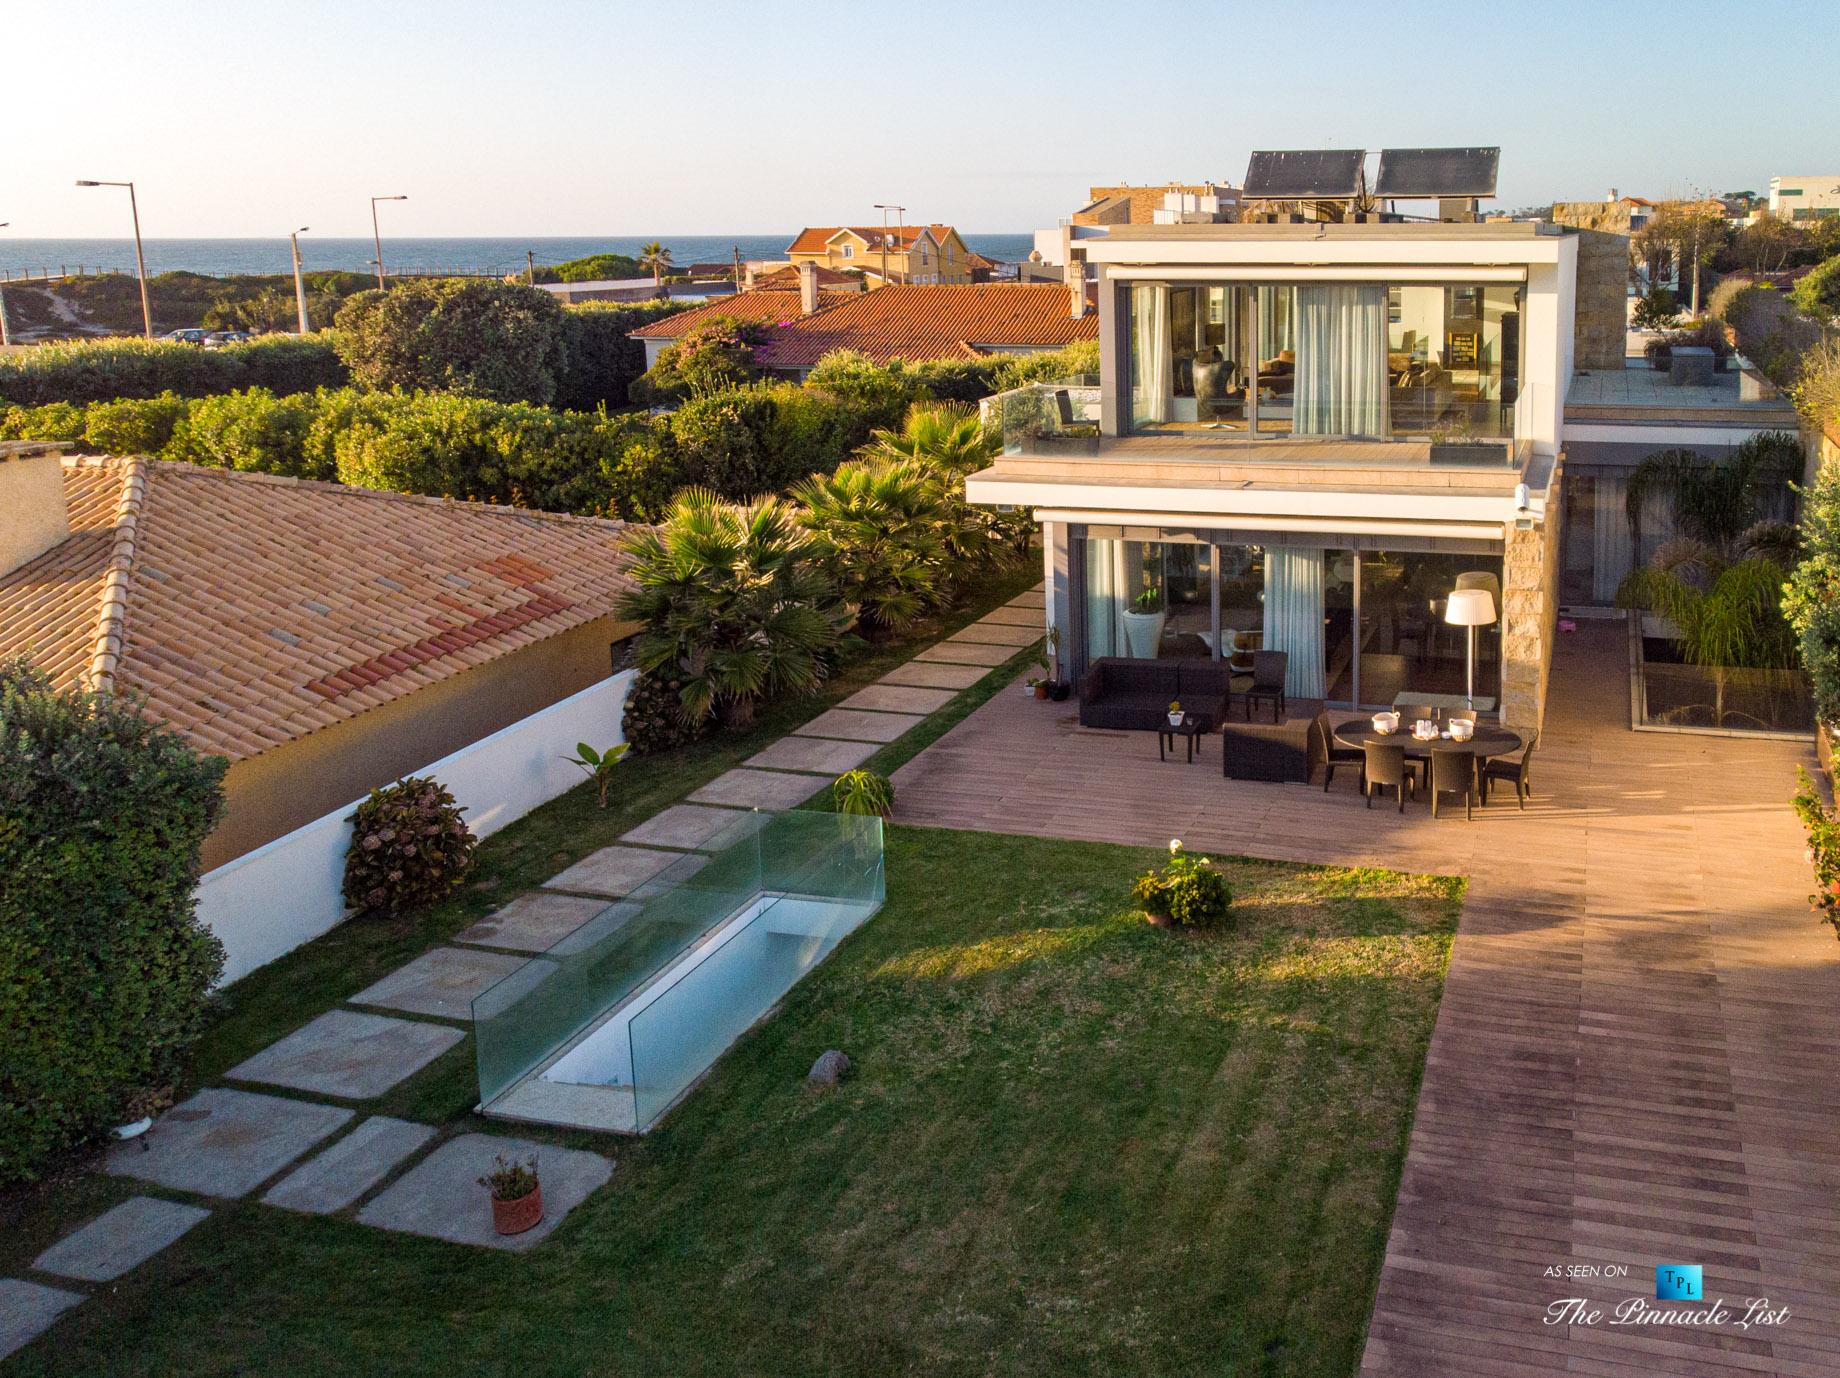 Francelos Beach Luxury T5 Villa – Porto, Portugal – Back Yard Underground Stairs – Luxury Real Estate – Modern Home